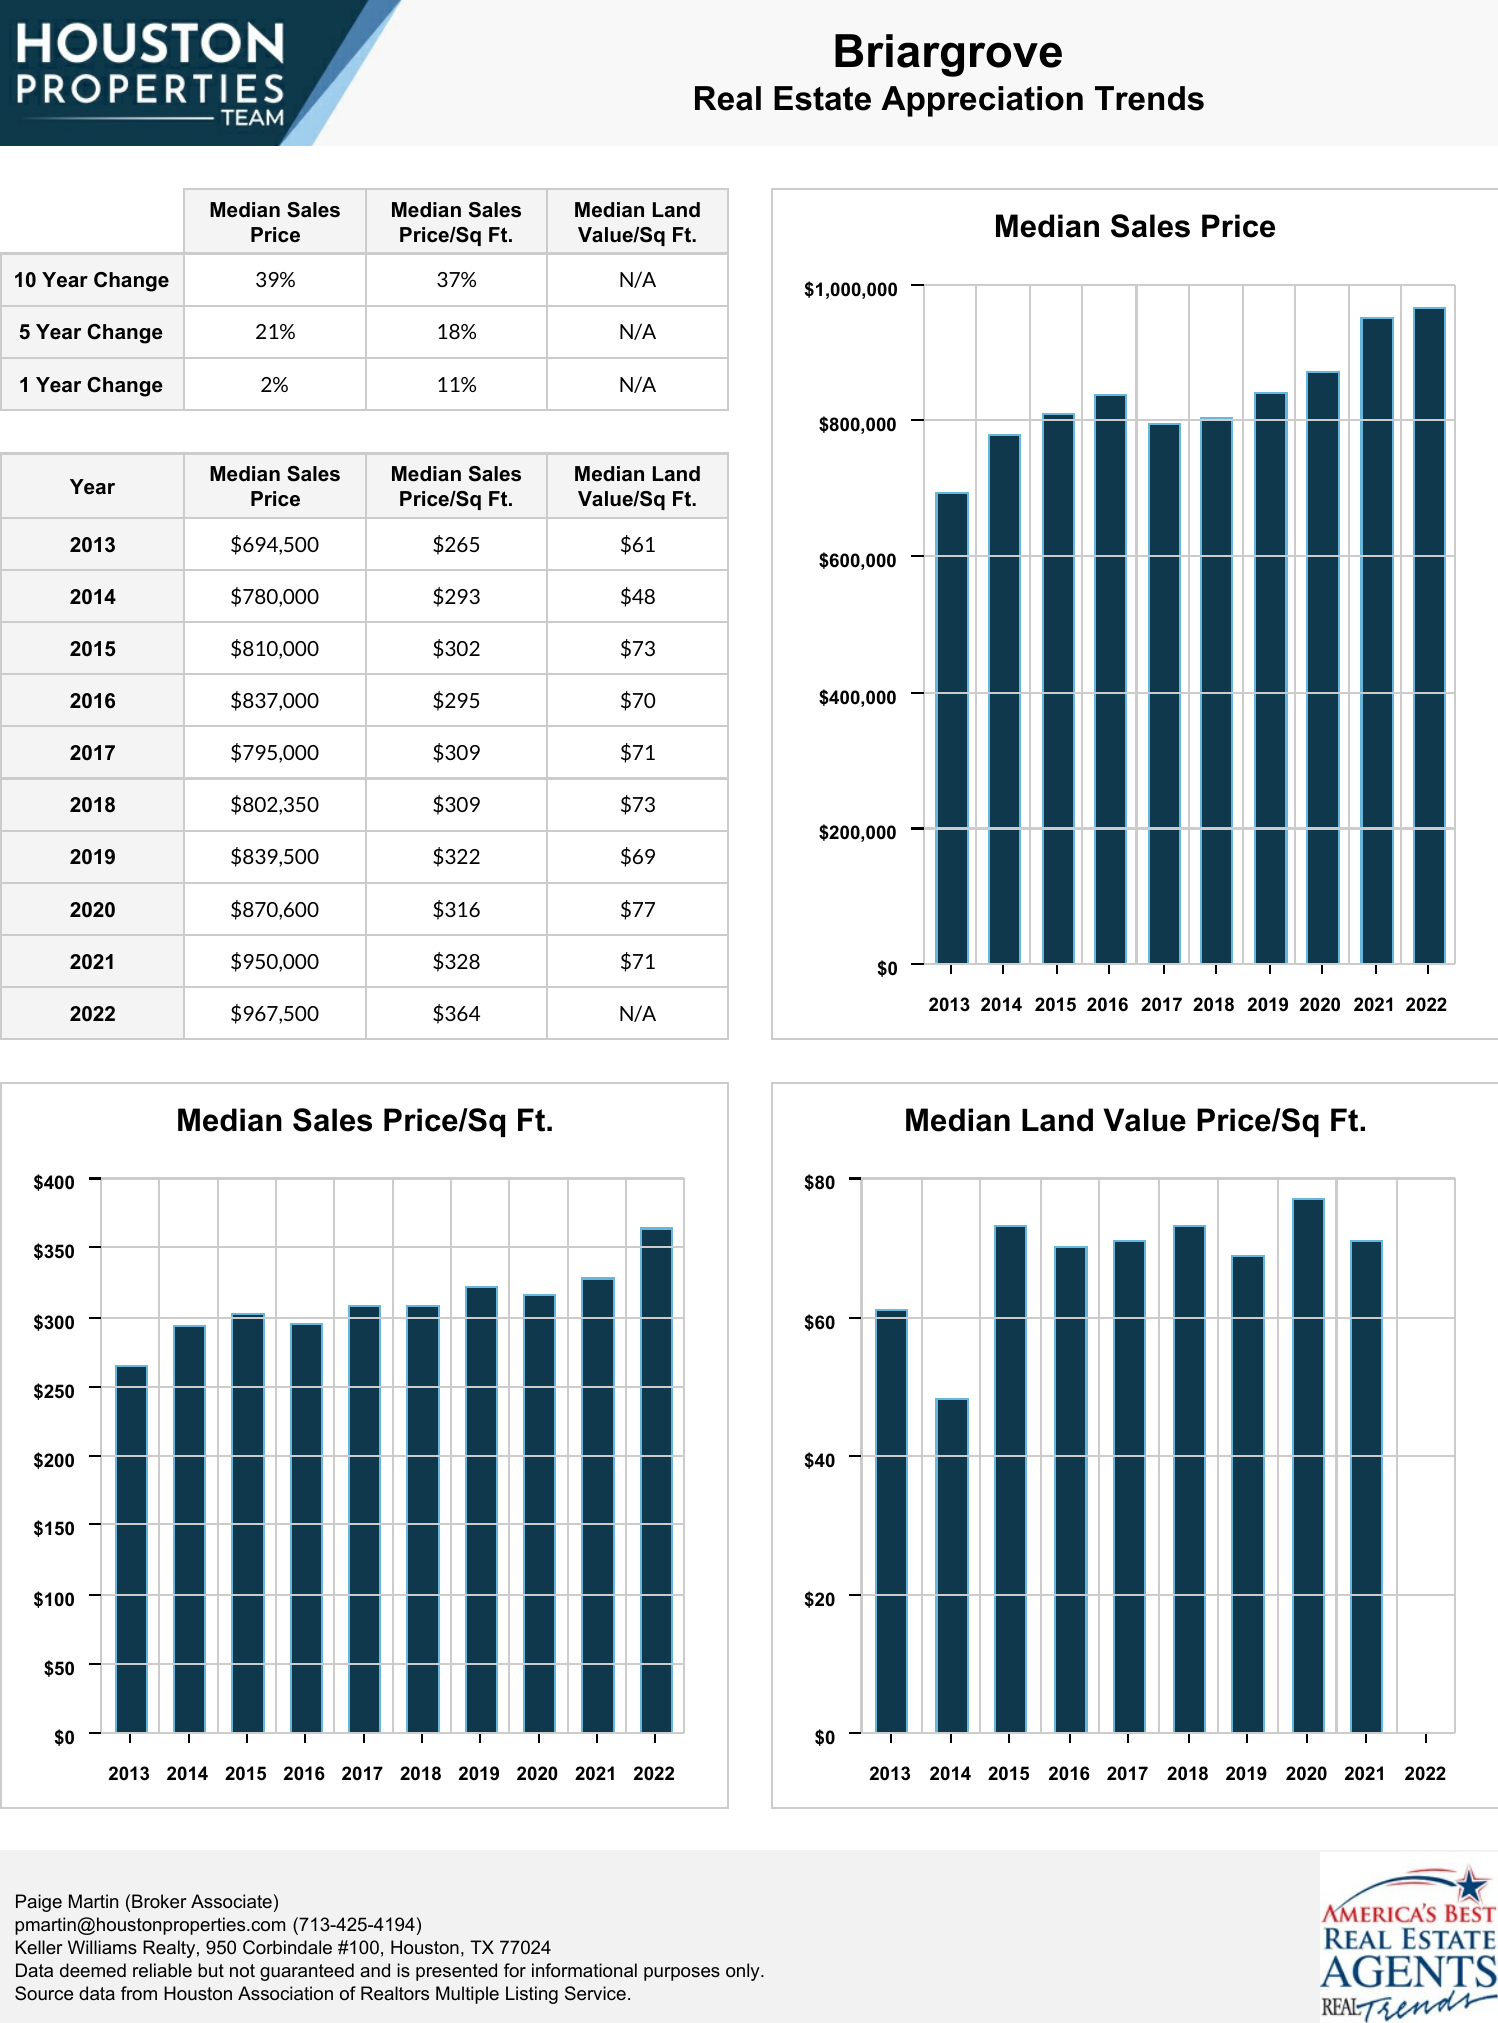 Briargrove Real Estate Trends